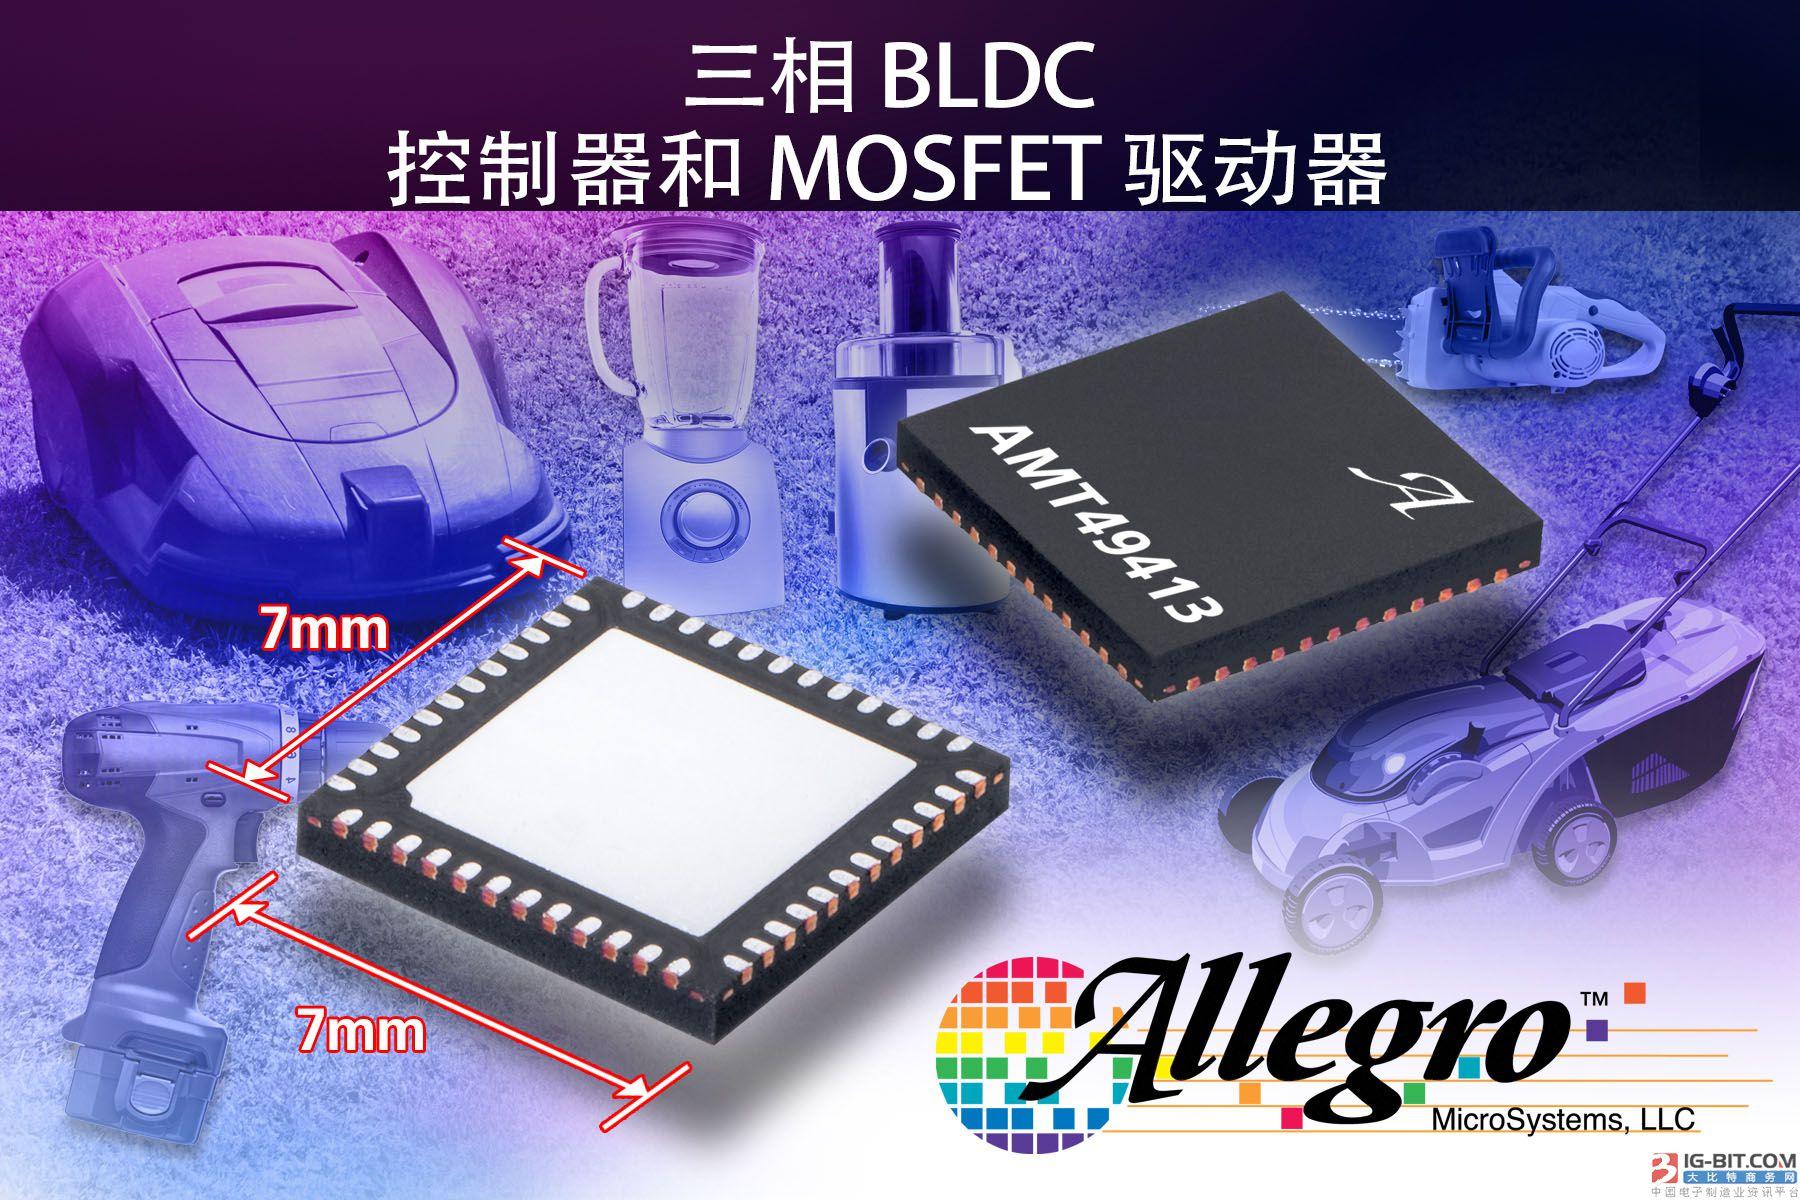 Allegro MicroSystems, LLC发布全新三相BLDC控制器和MOSFET驱动器IC